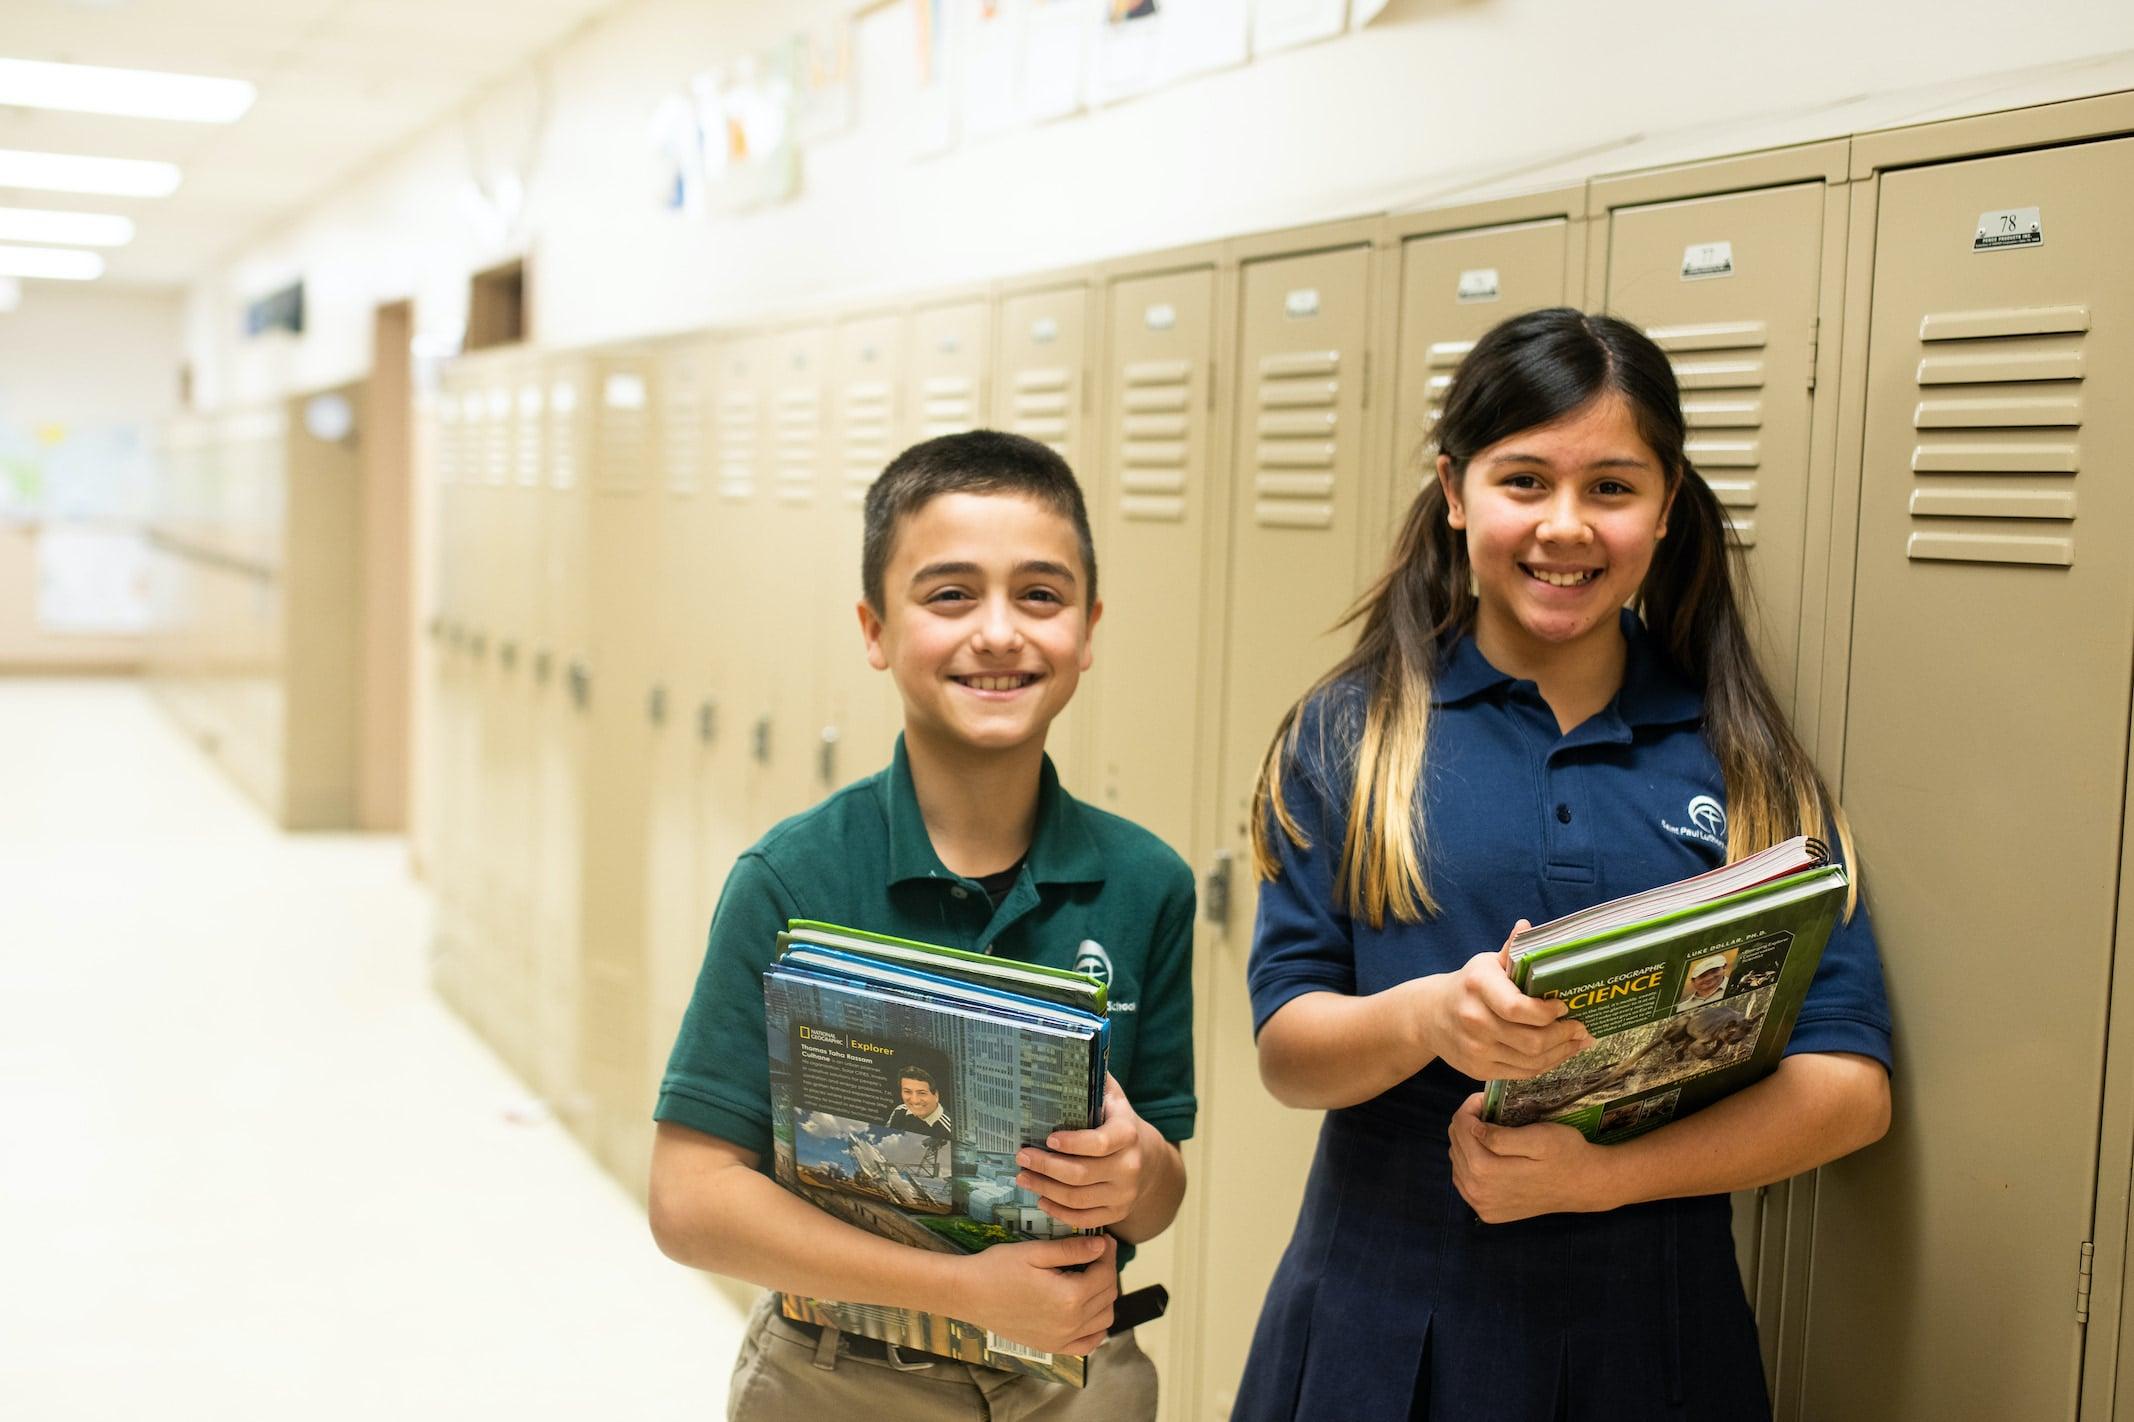 kids holding books in school